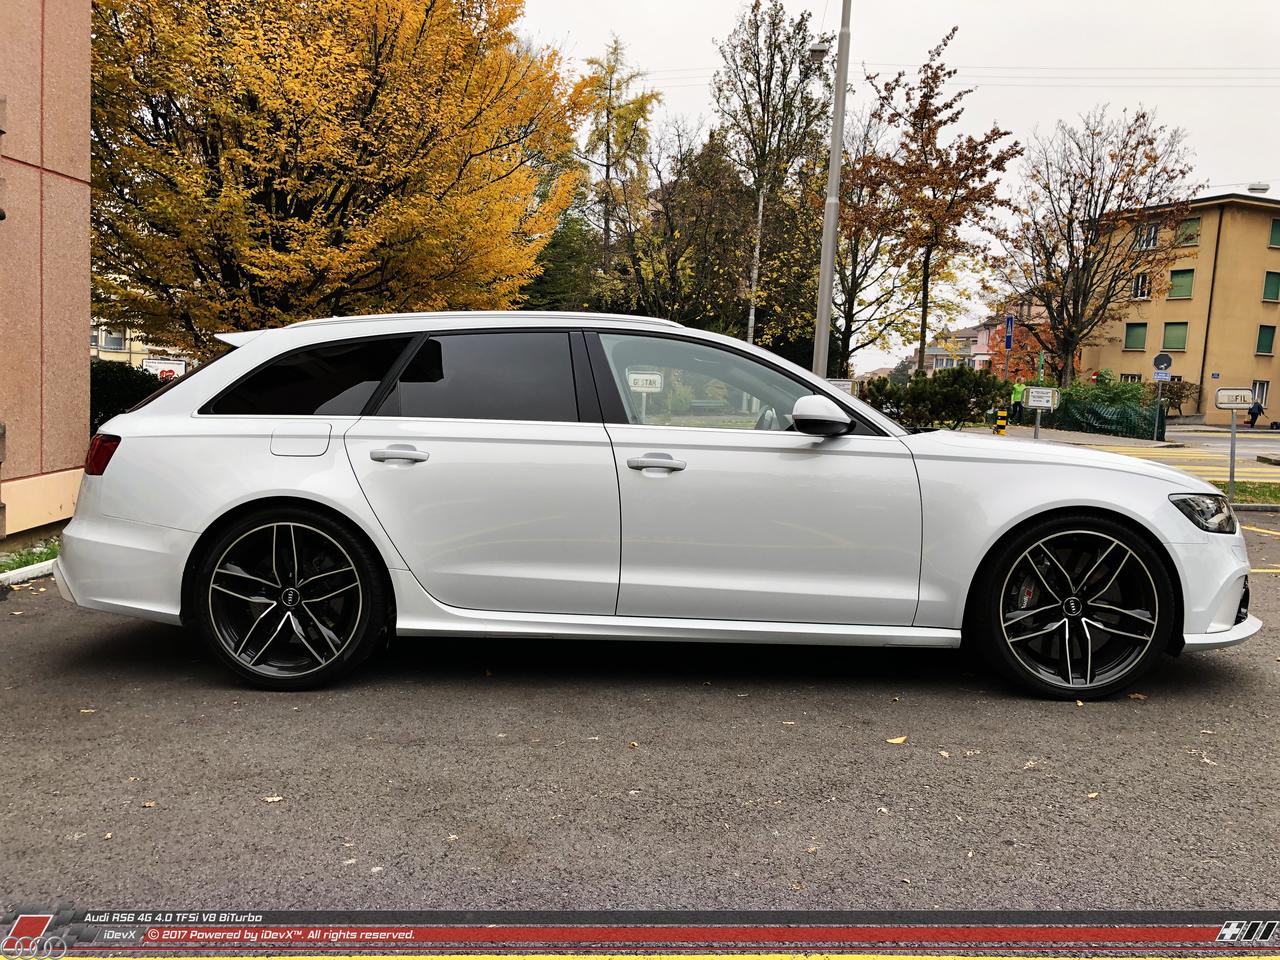 10_11.2018_Audi-RS6_iDevX_029.png